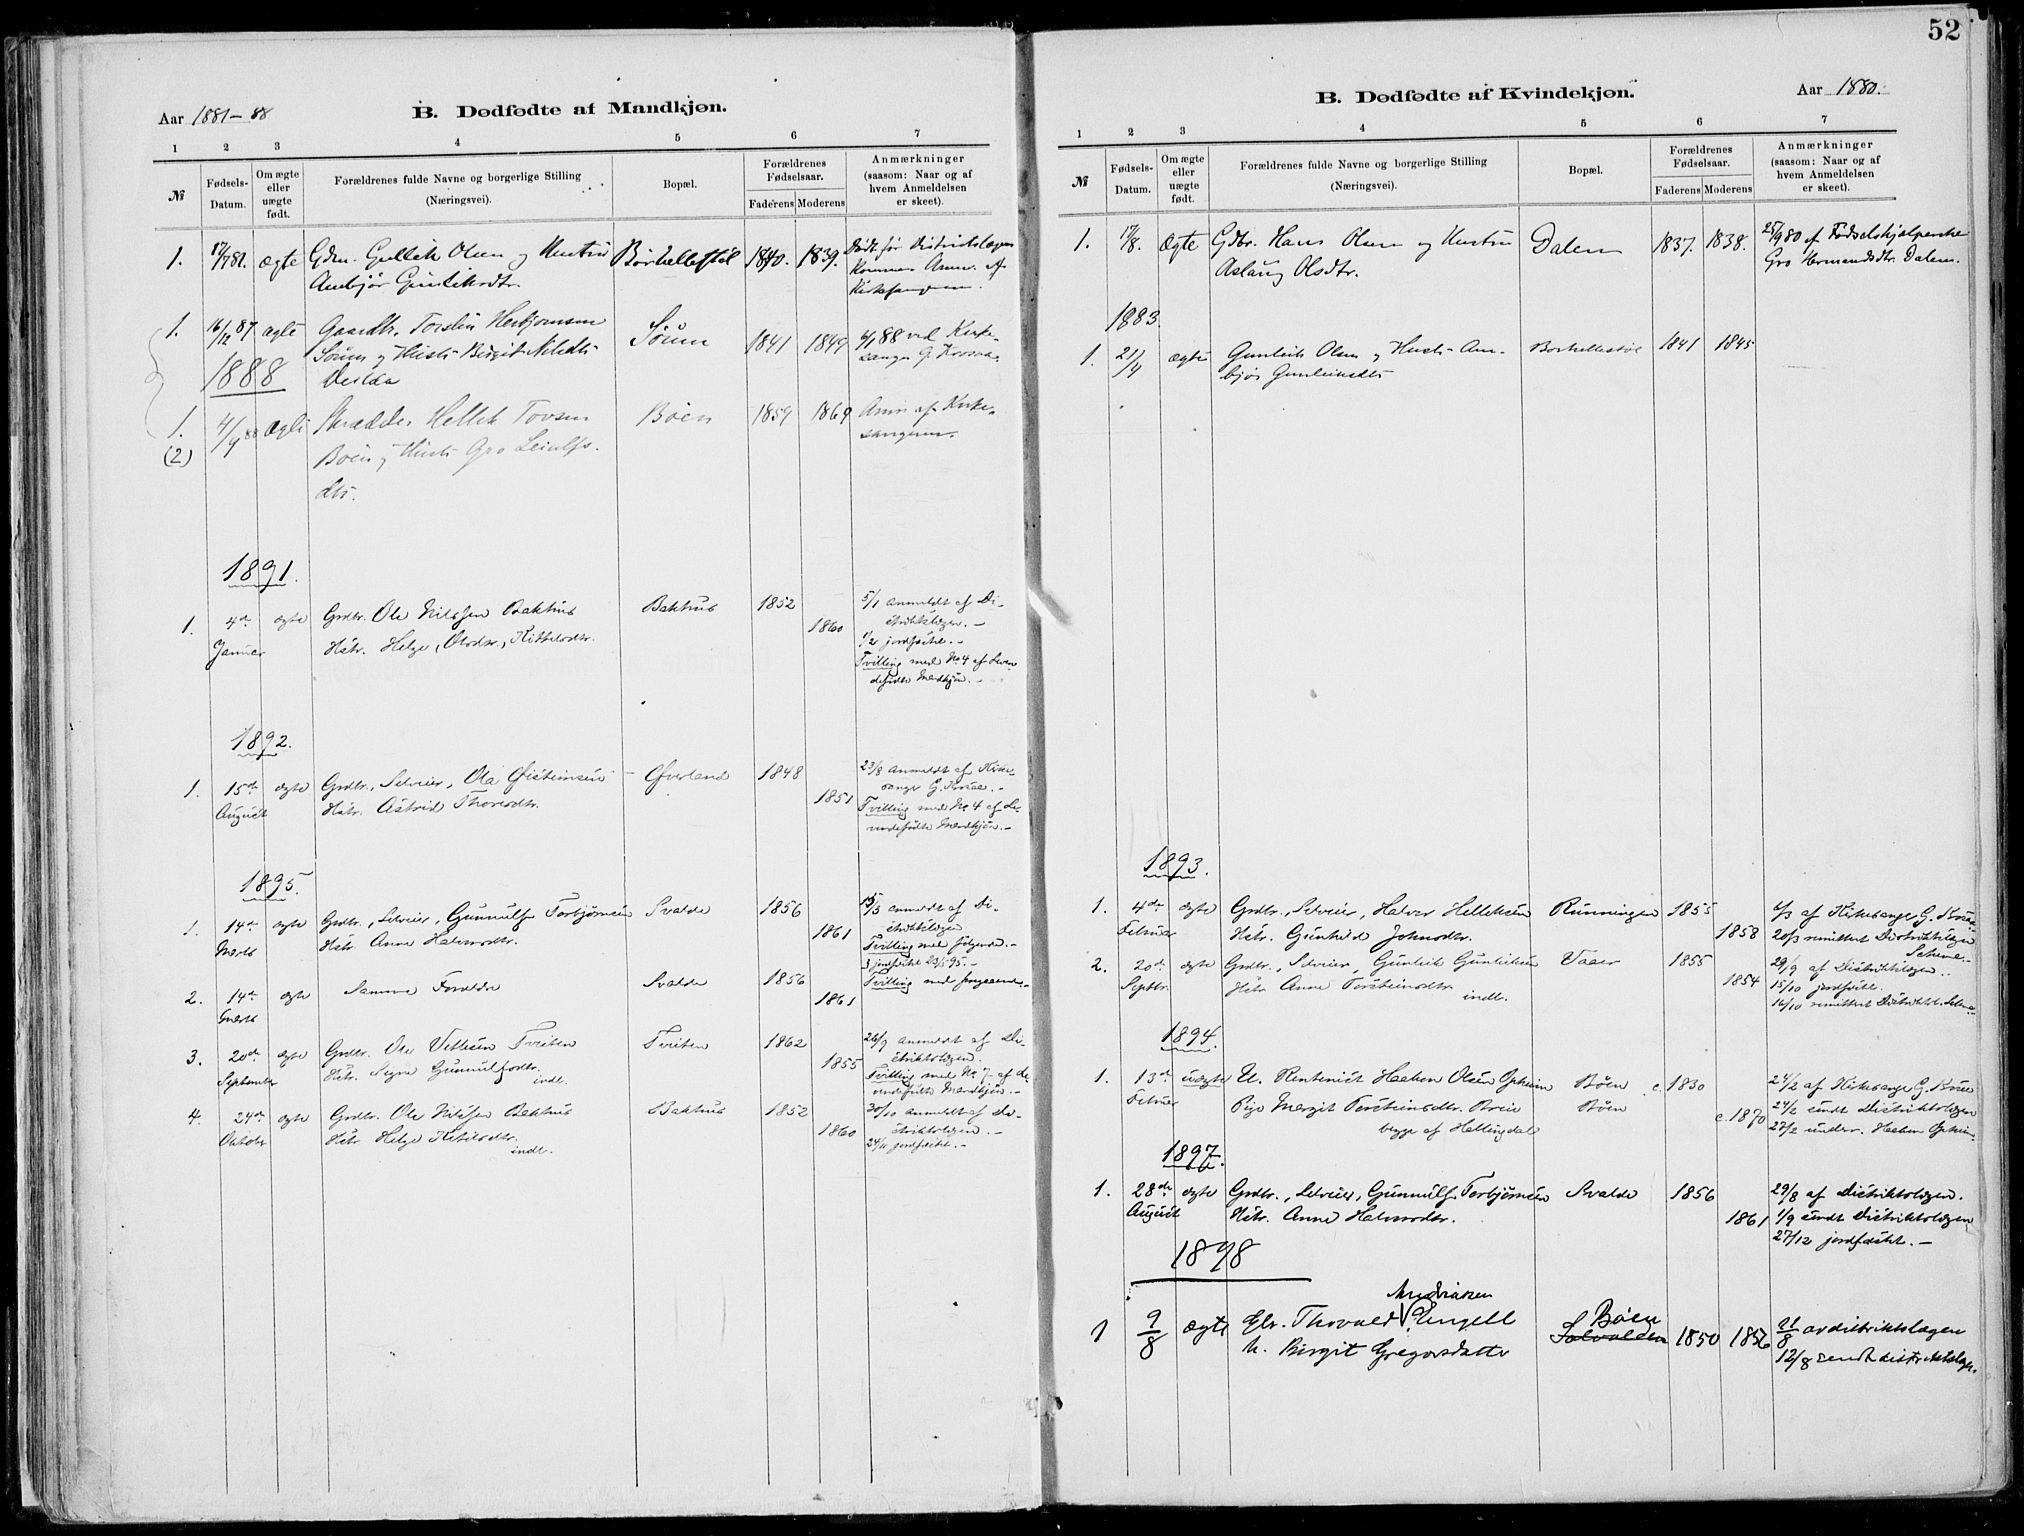 SAKO, Rjukan kirkebøker, F/Fa/L0001: Ministerialbok nr. 1, 1878-1912, s. 52